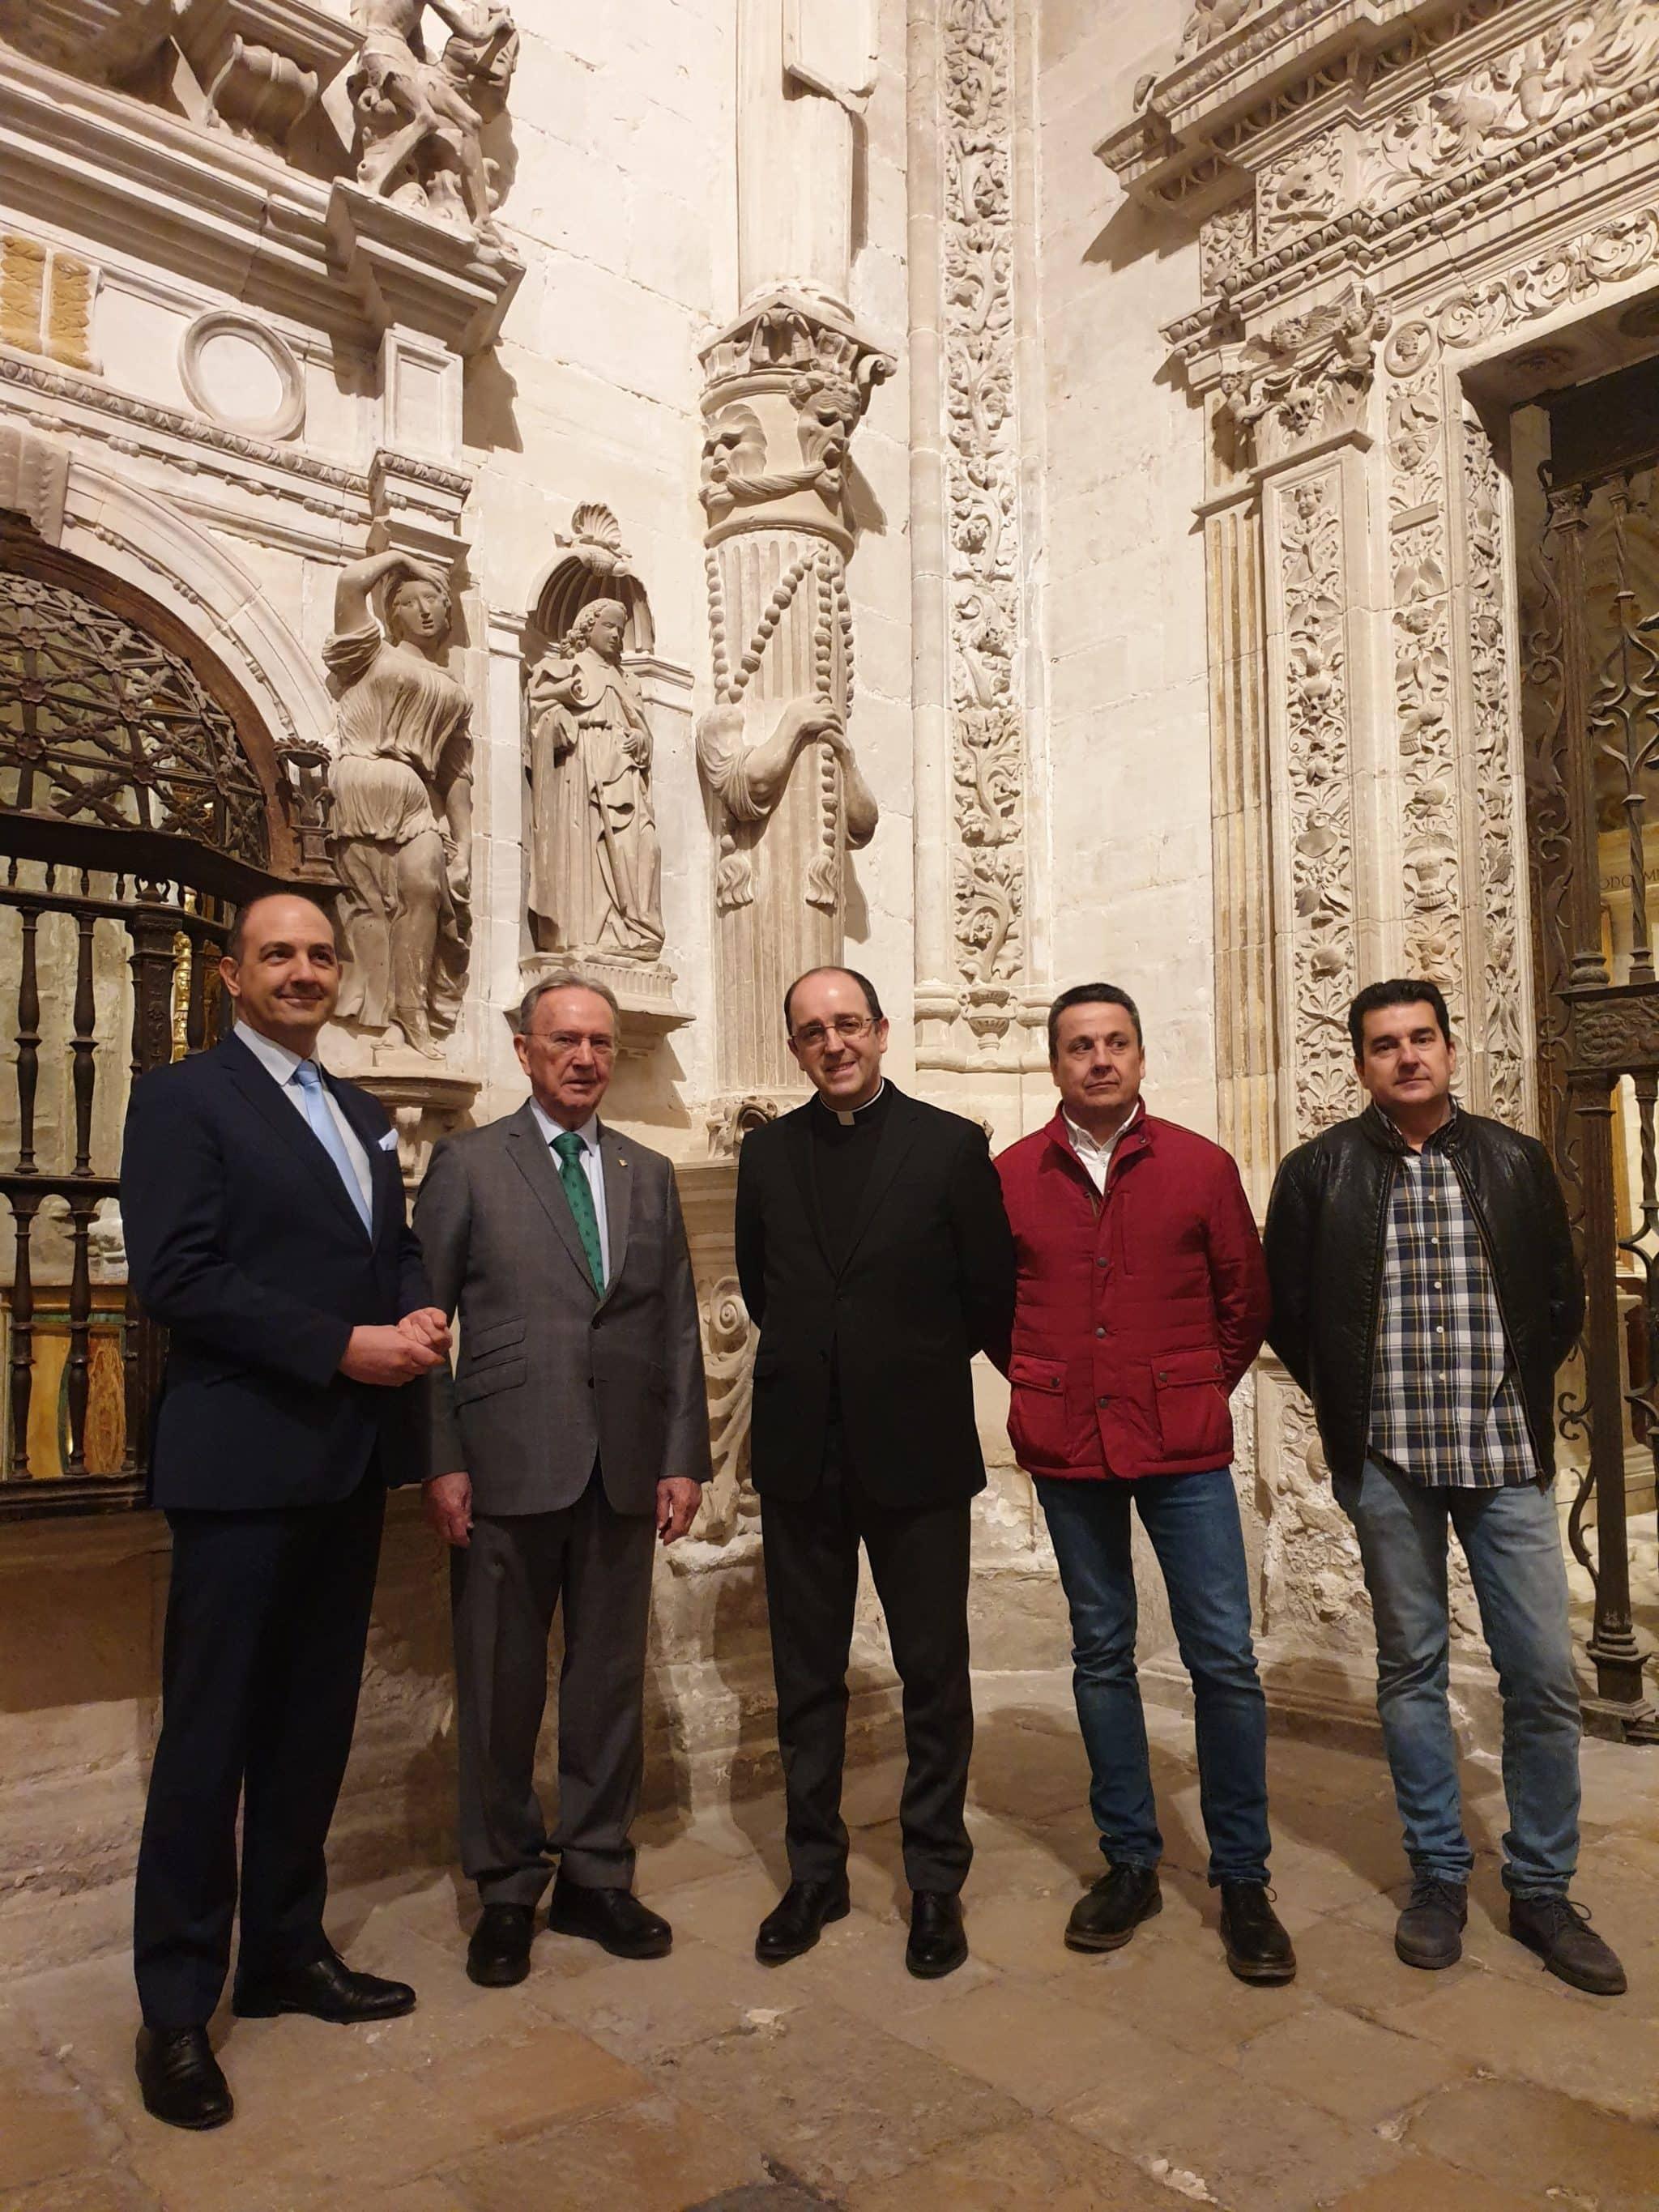 https://blog.globalcaja.es/wp-content/uploads/2020/03/iluminacion-artistica-catedral-de-cuenca-e1583430559784.jpg